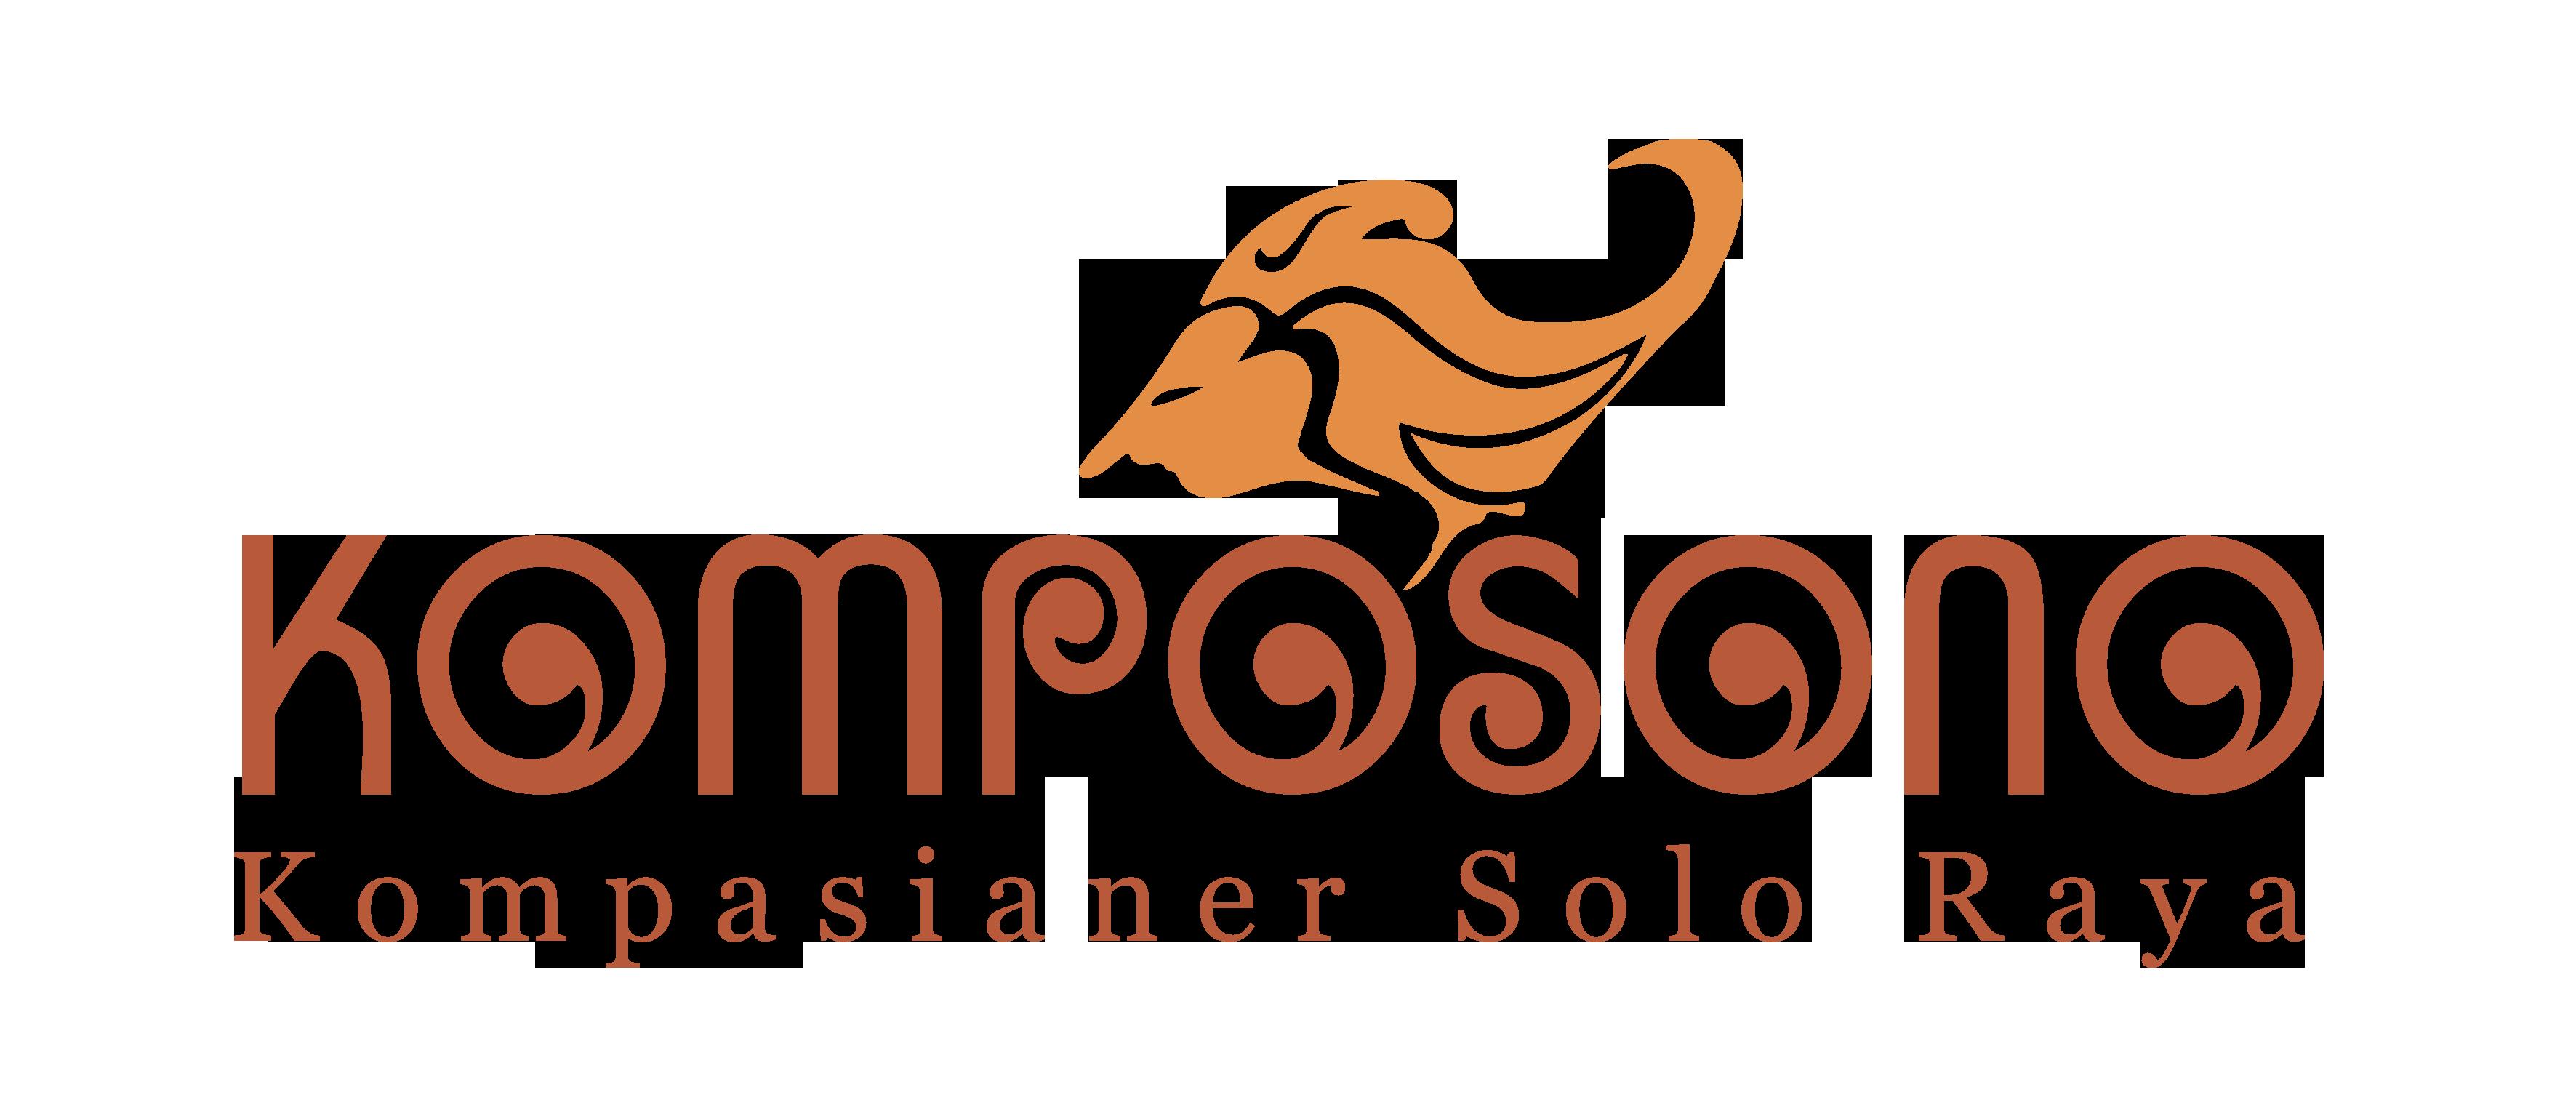 items/kaleidoskop_2020/komposono-1607604297.png